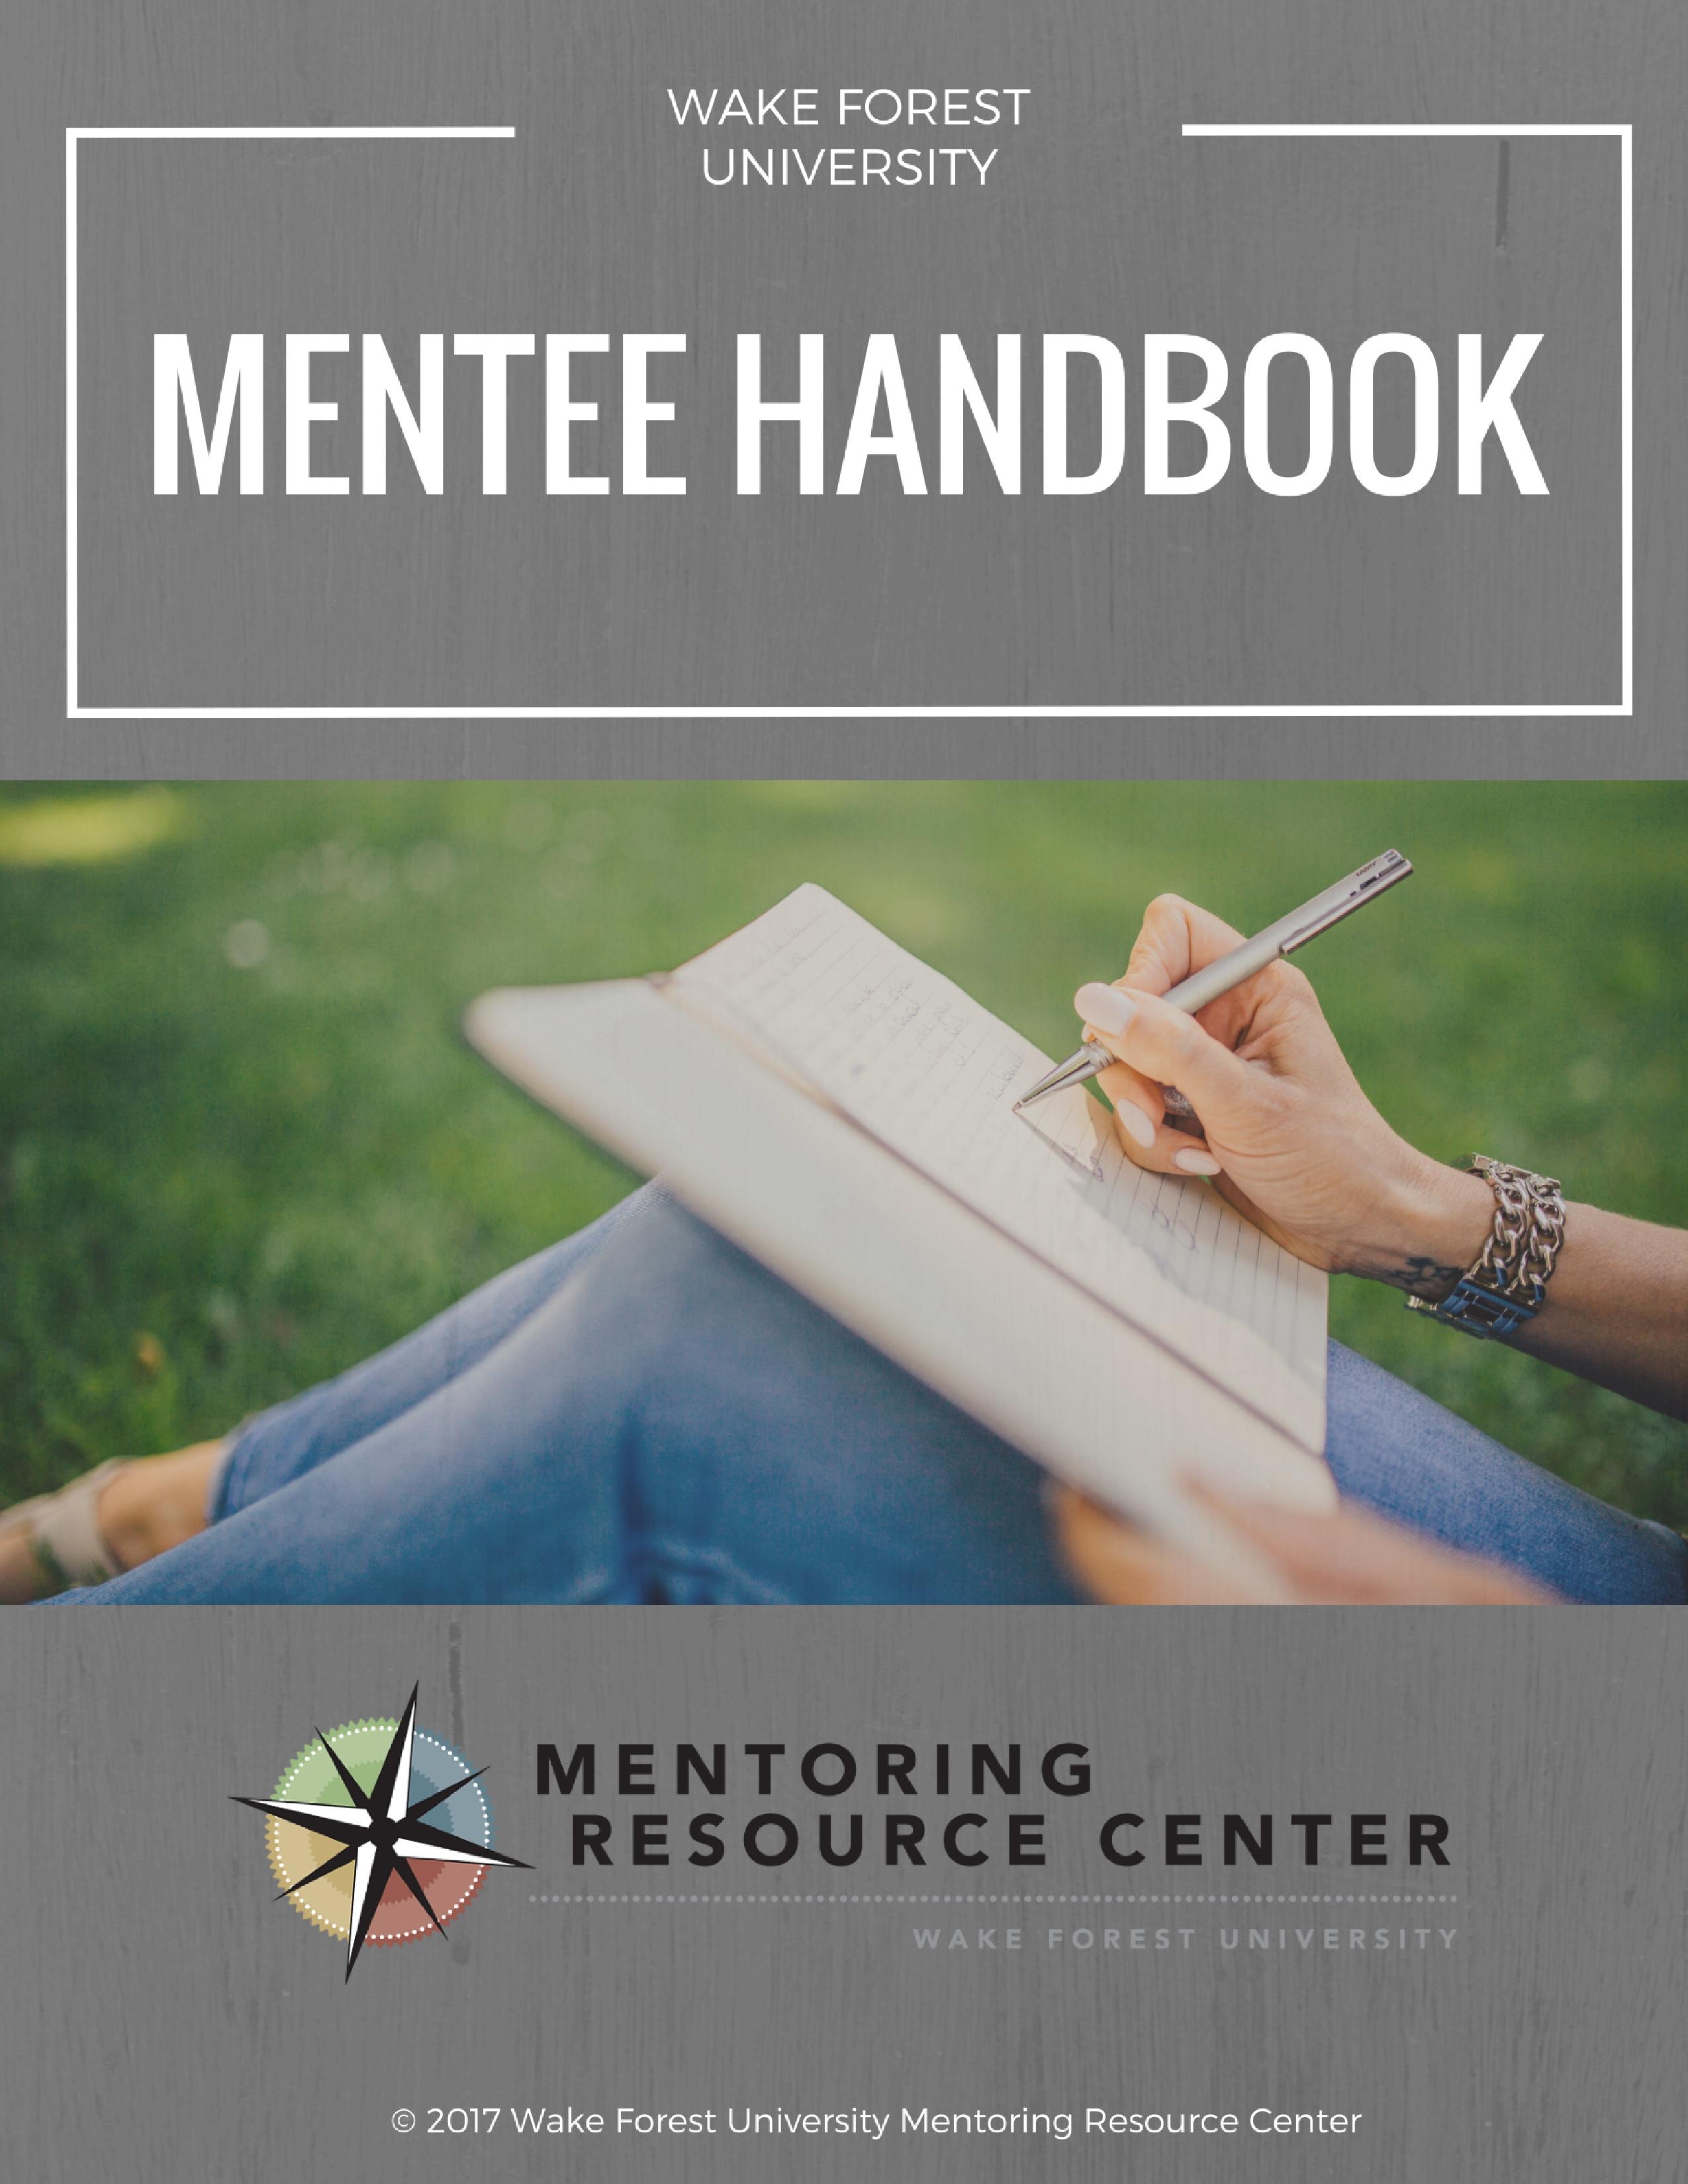 Mentee Handbook